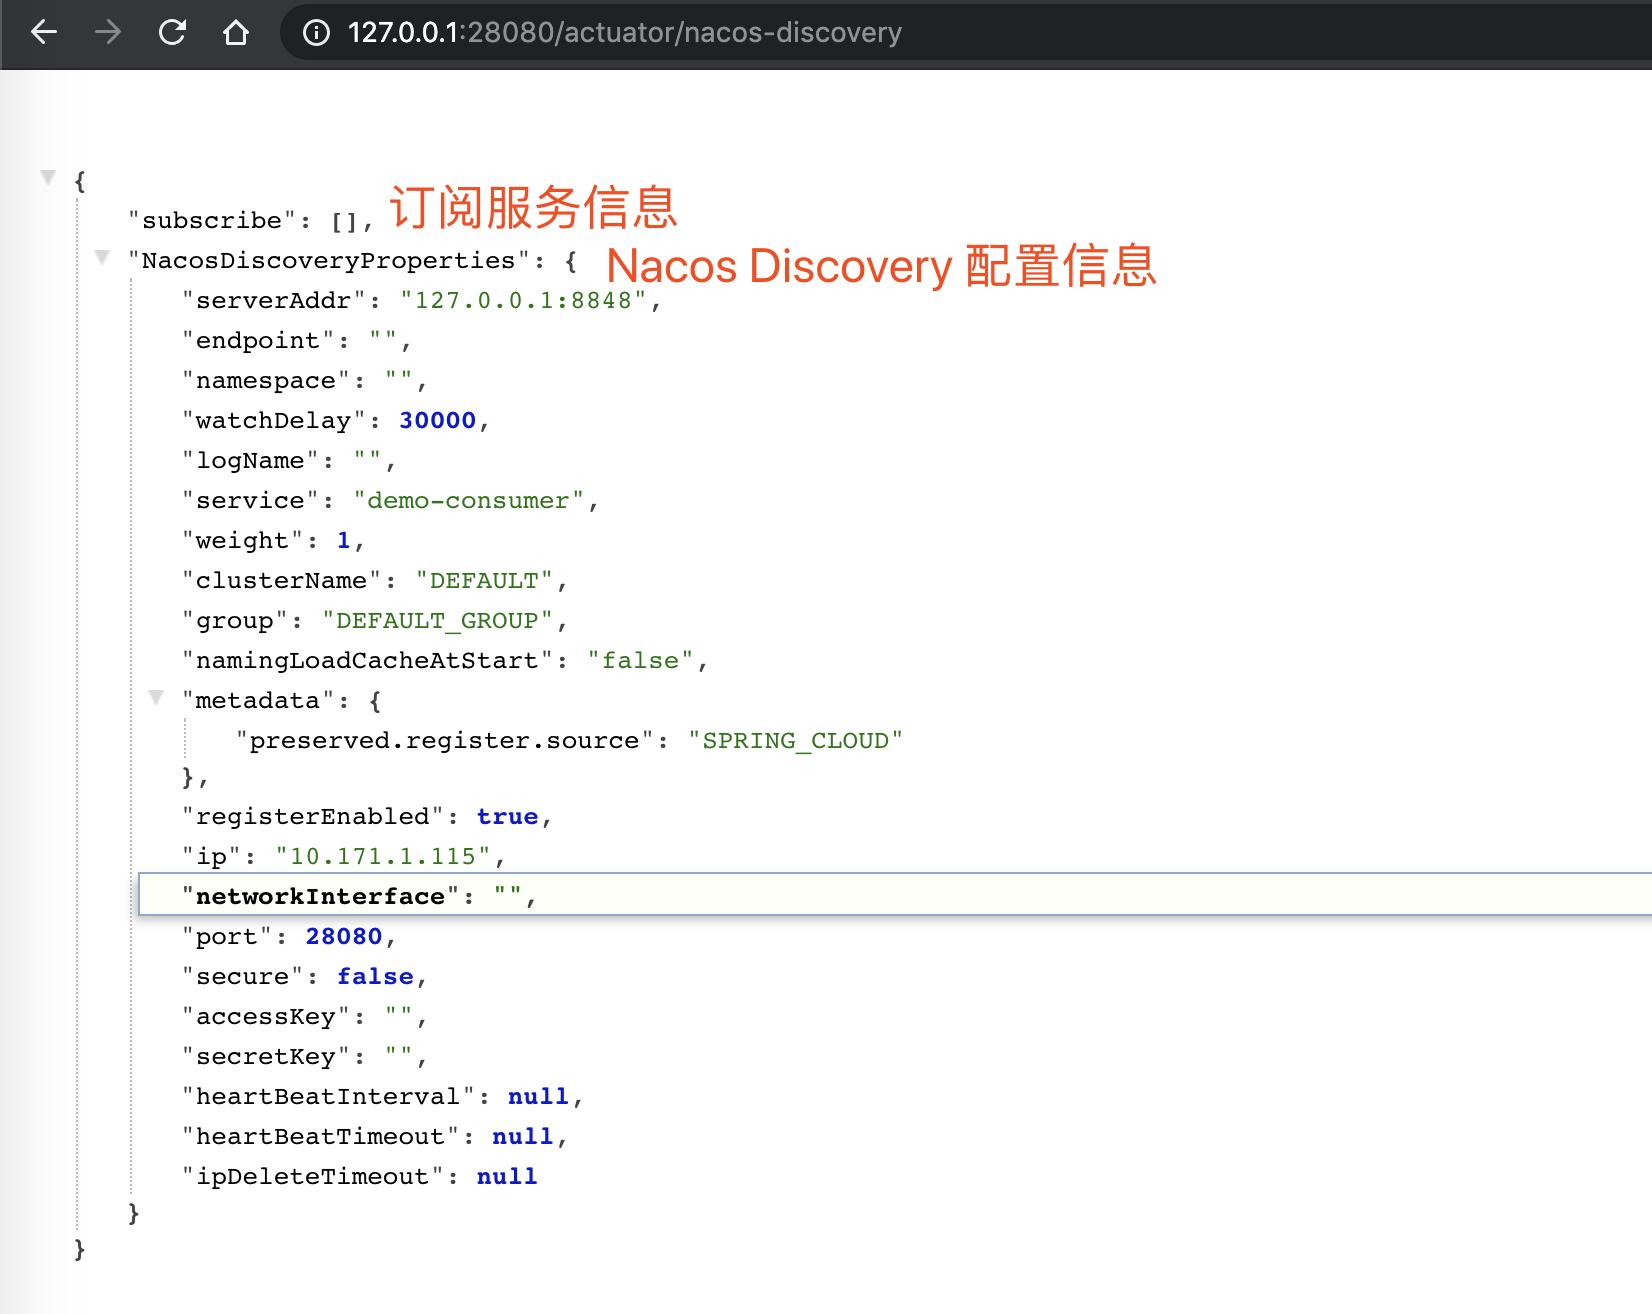 nacos-discovery 监控端点